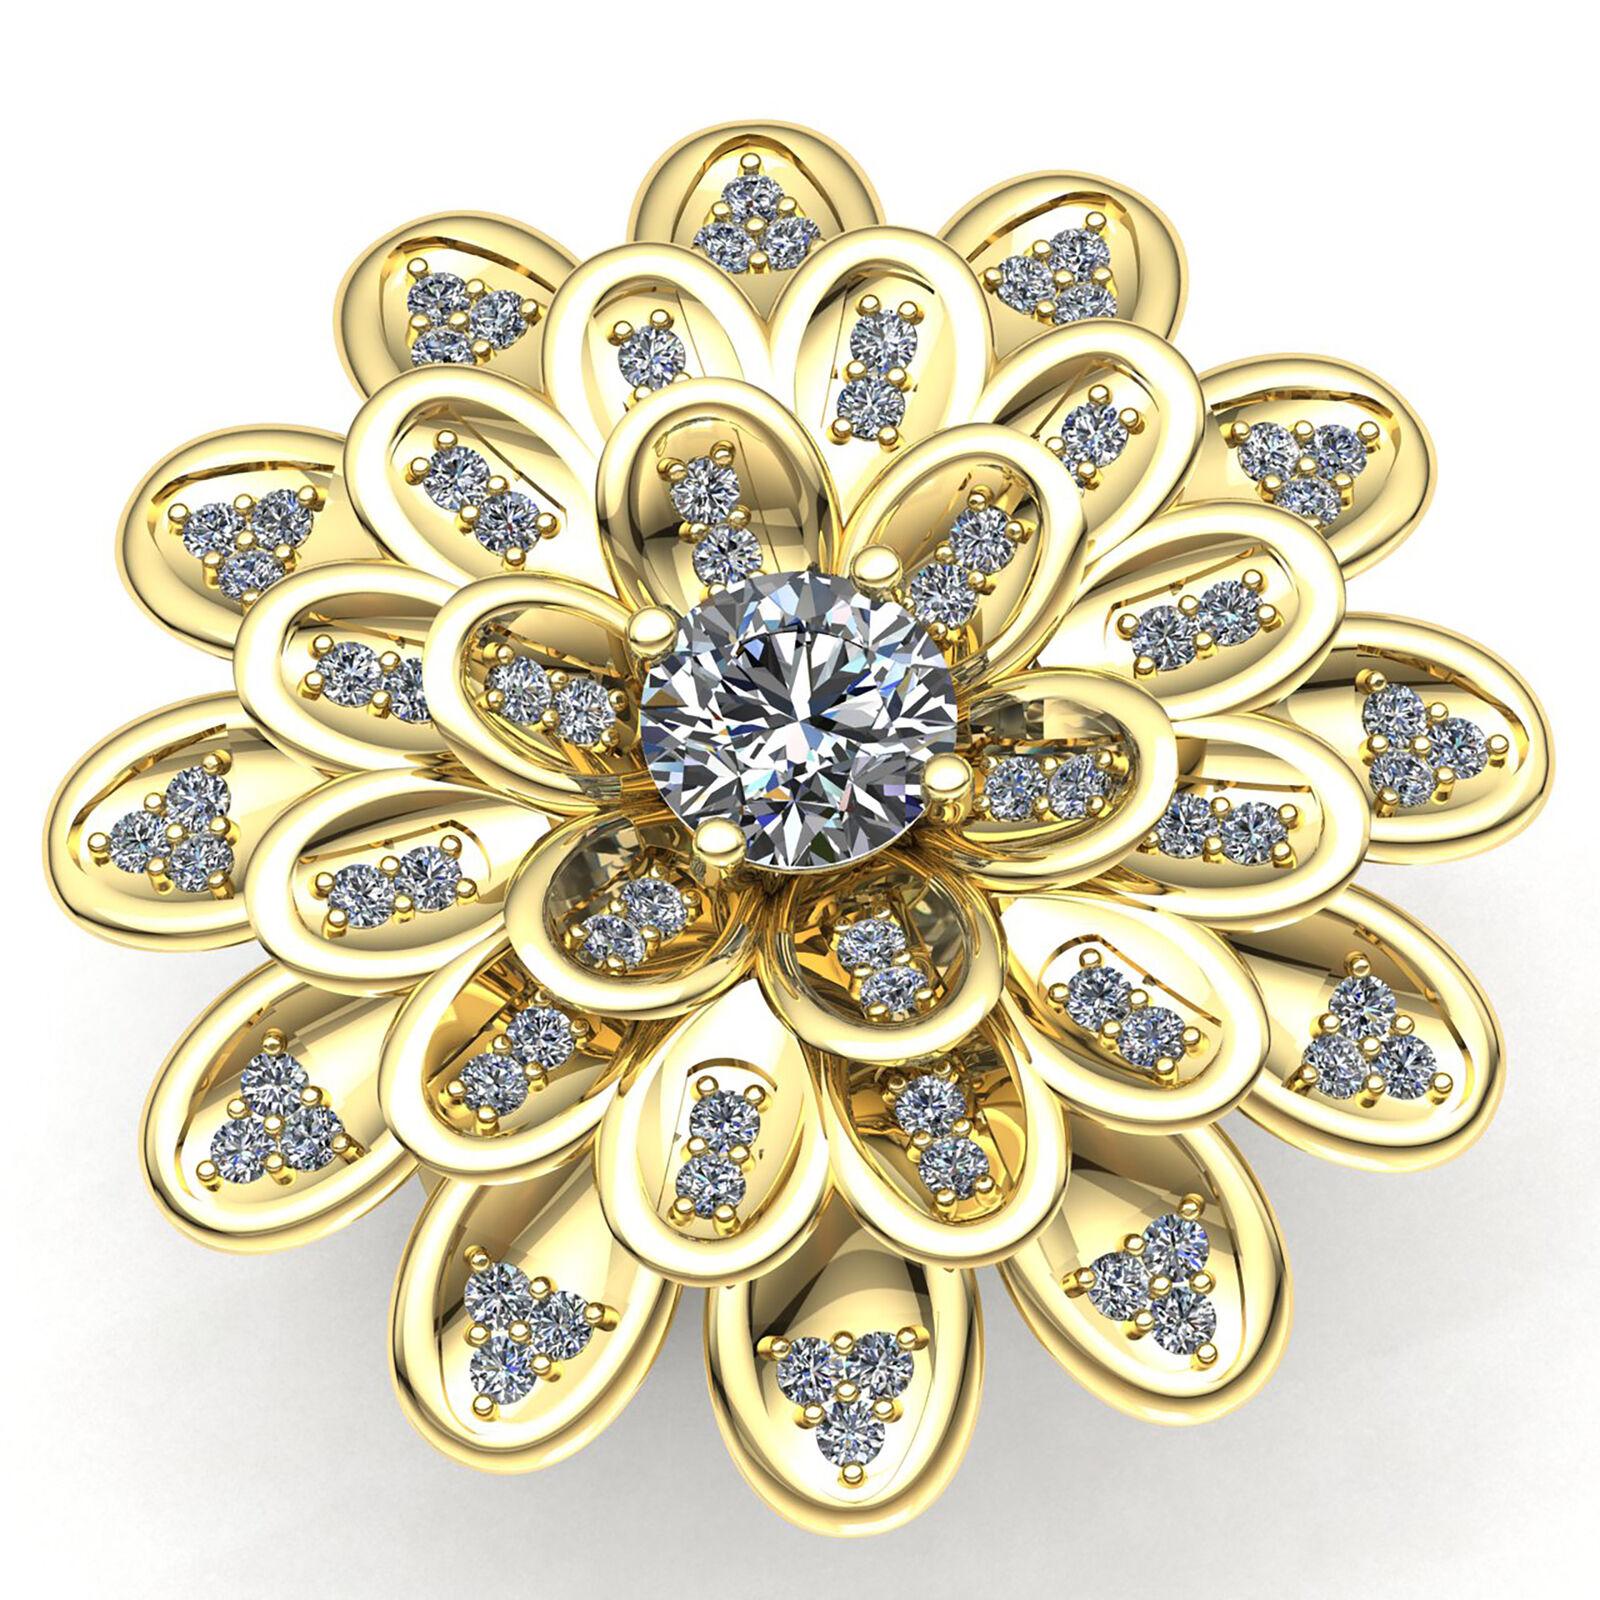 Genuine 1.5ct Round Cut Diamond Ladies Fancy Flower Engagement Ring 14K gold